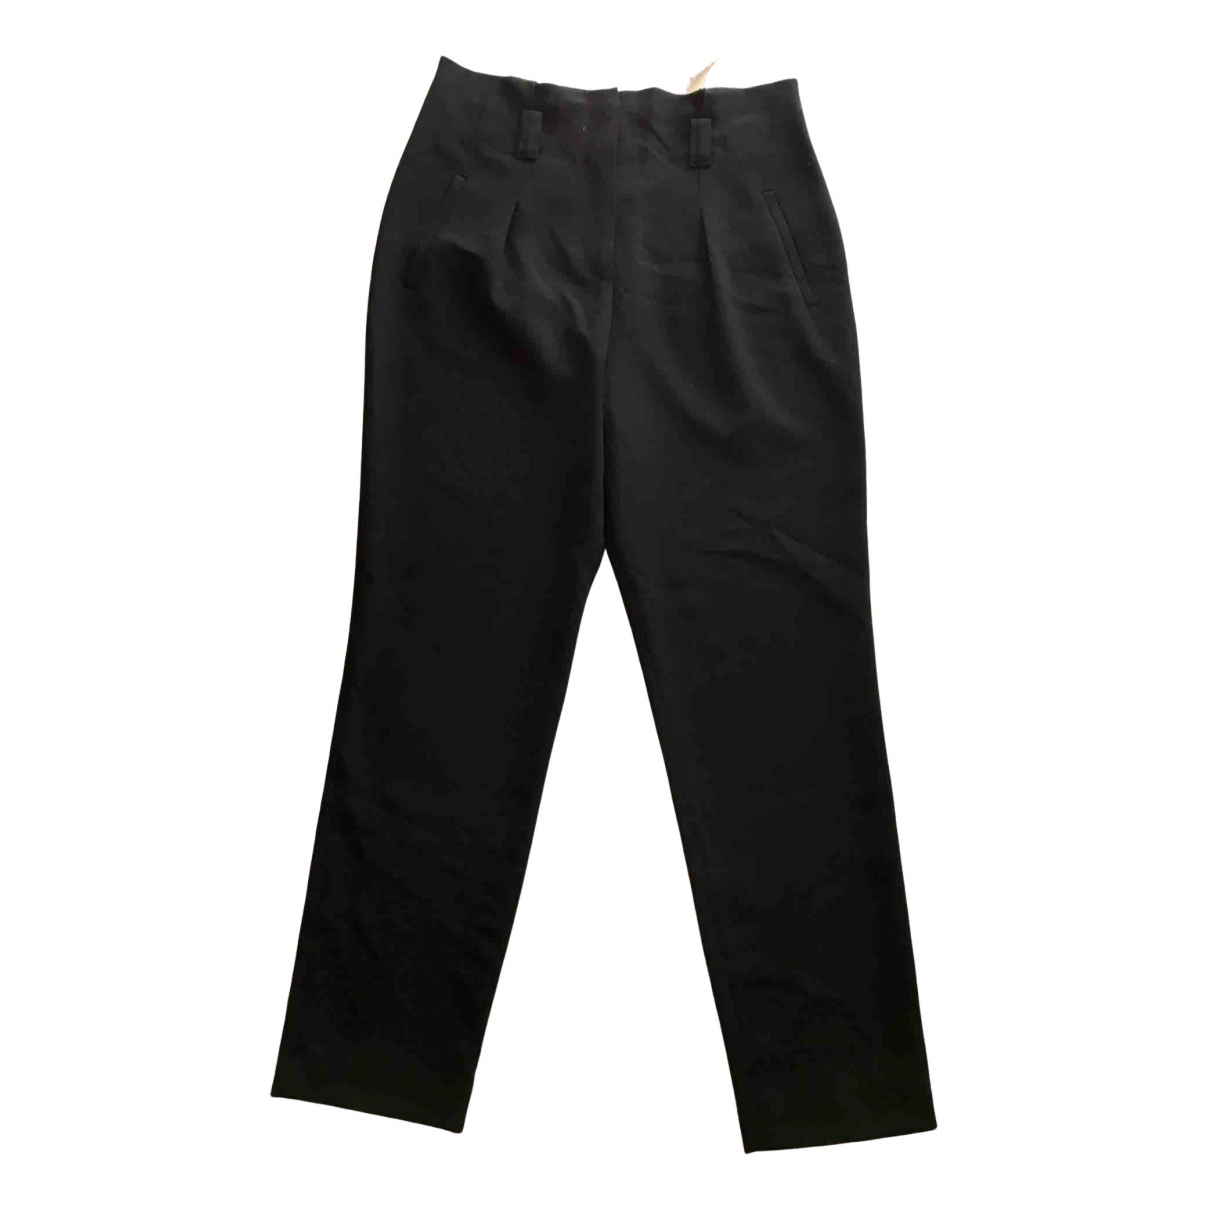 Pantalon zanahoria Spring Summer 2020 Claudie Pierlot